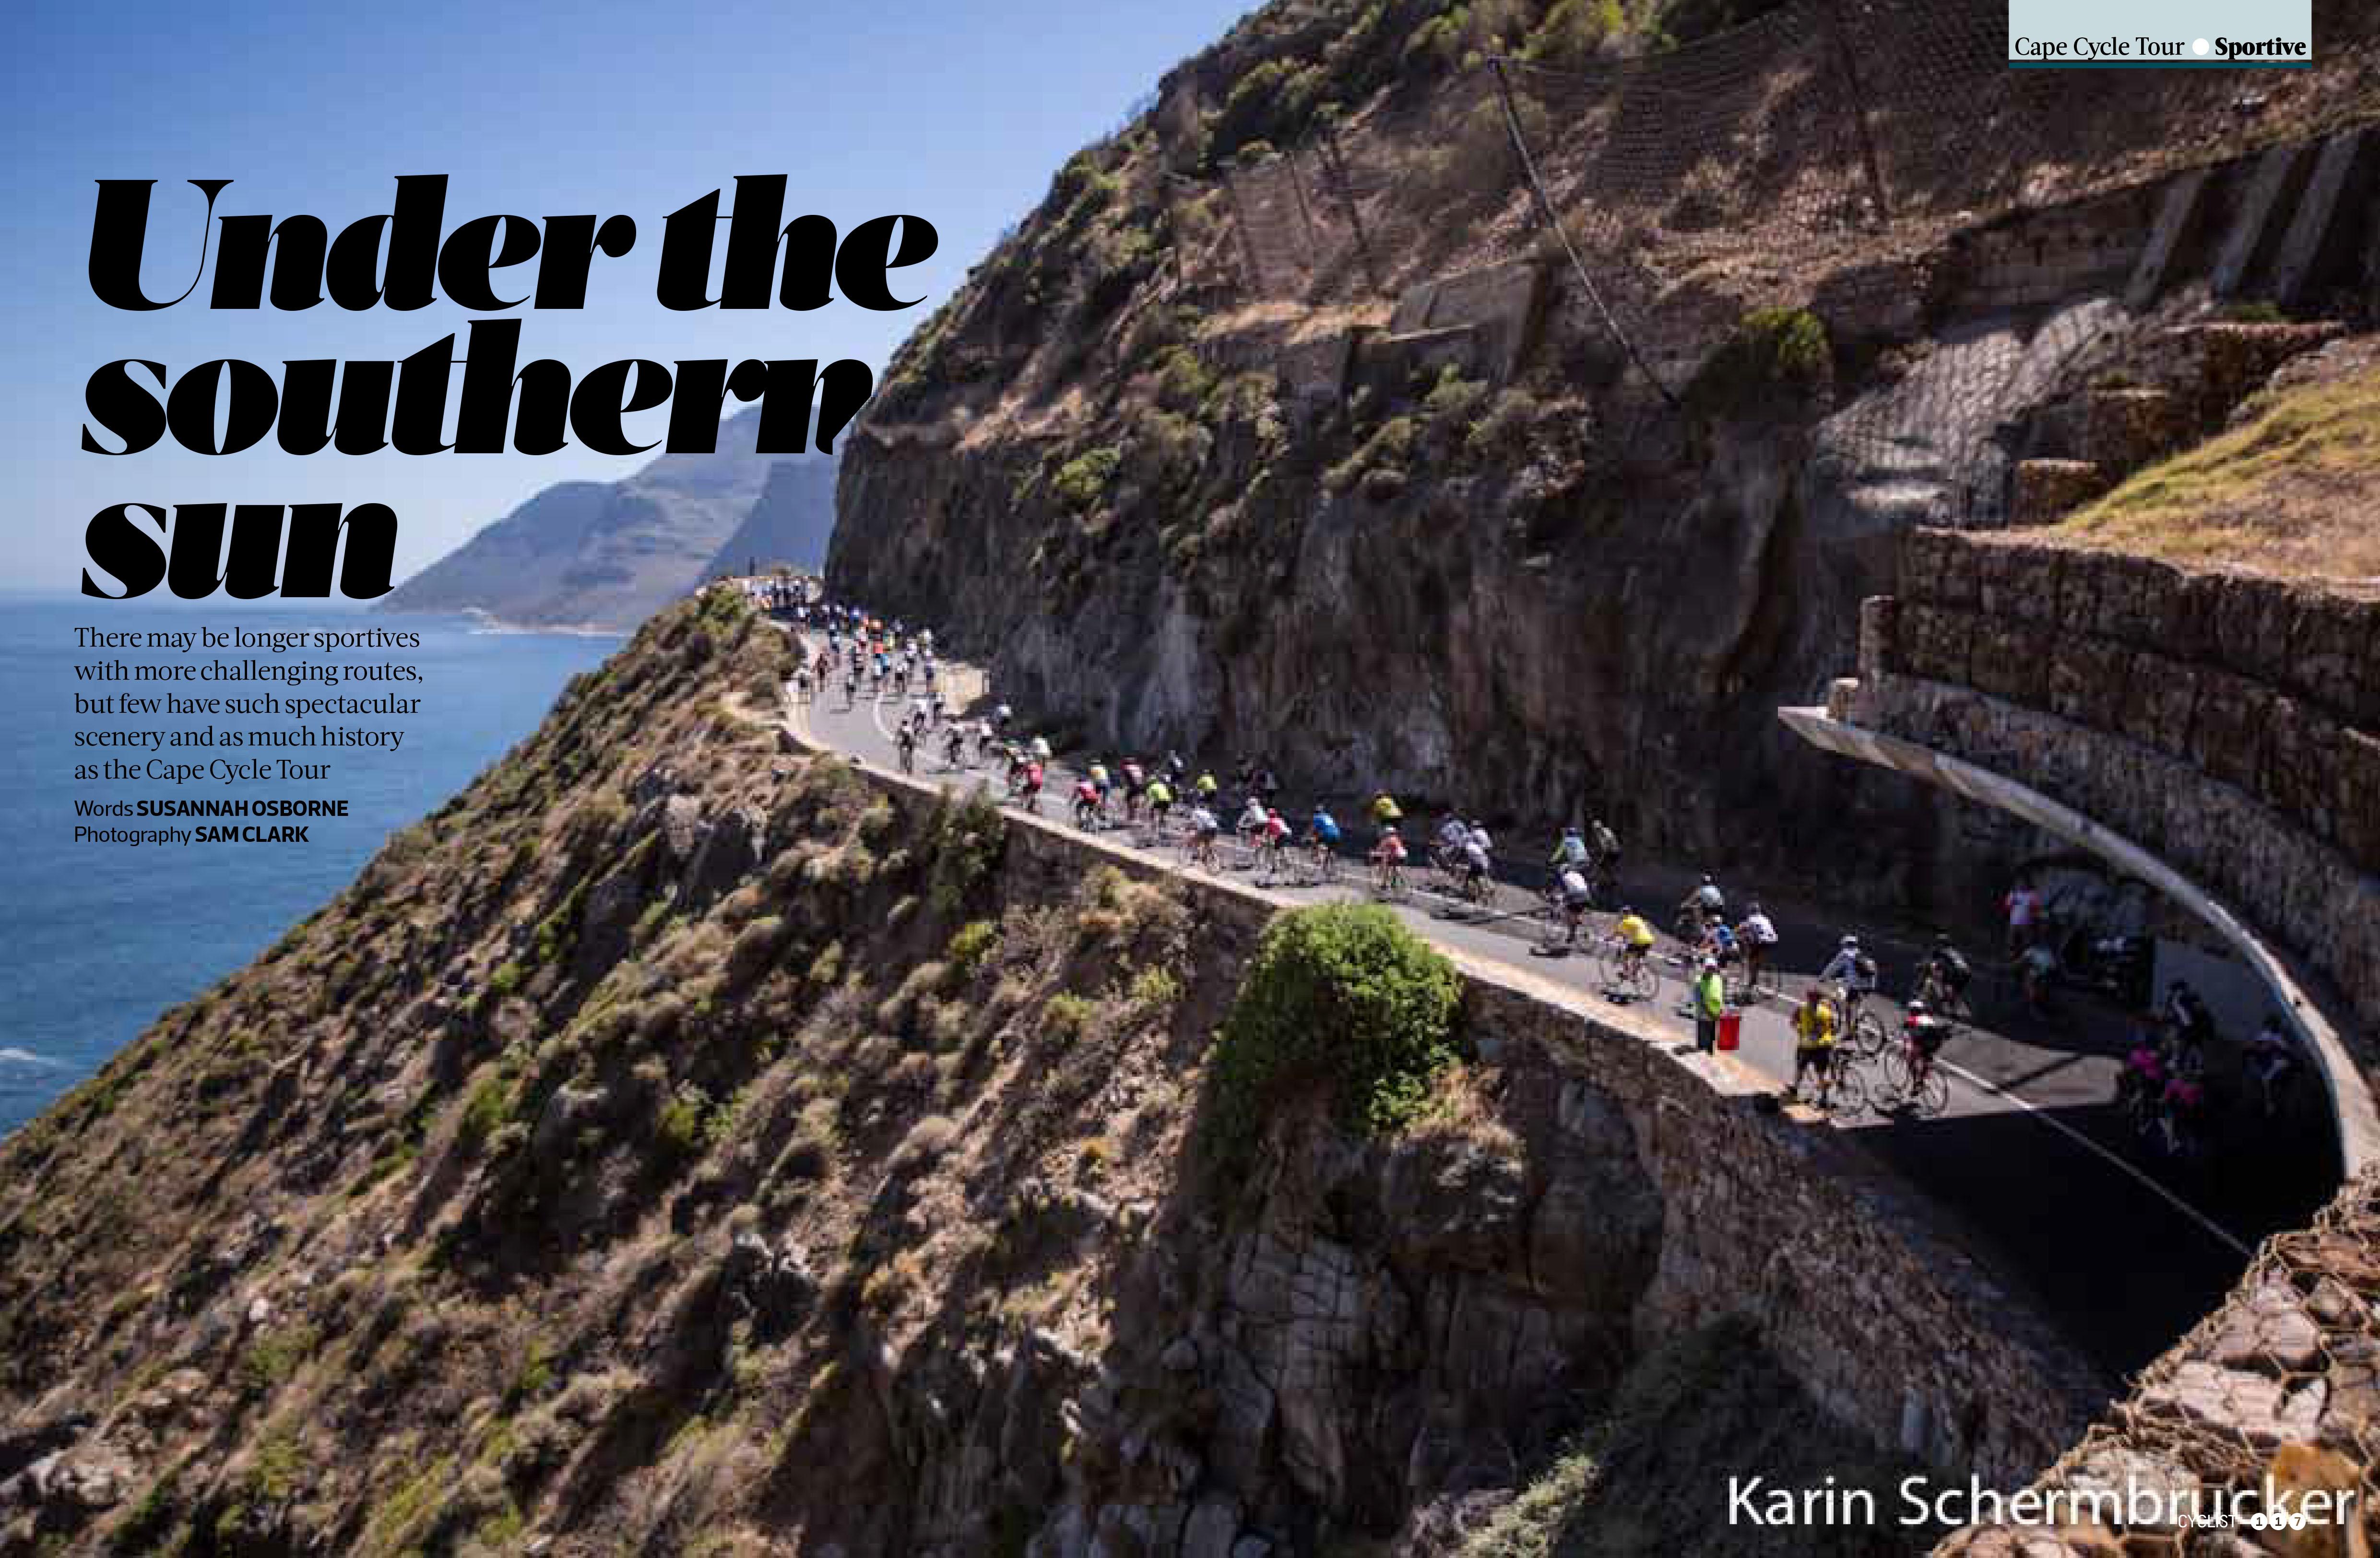 CY_L_sept16_Cape Cycle Tour.md-1